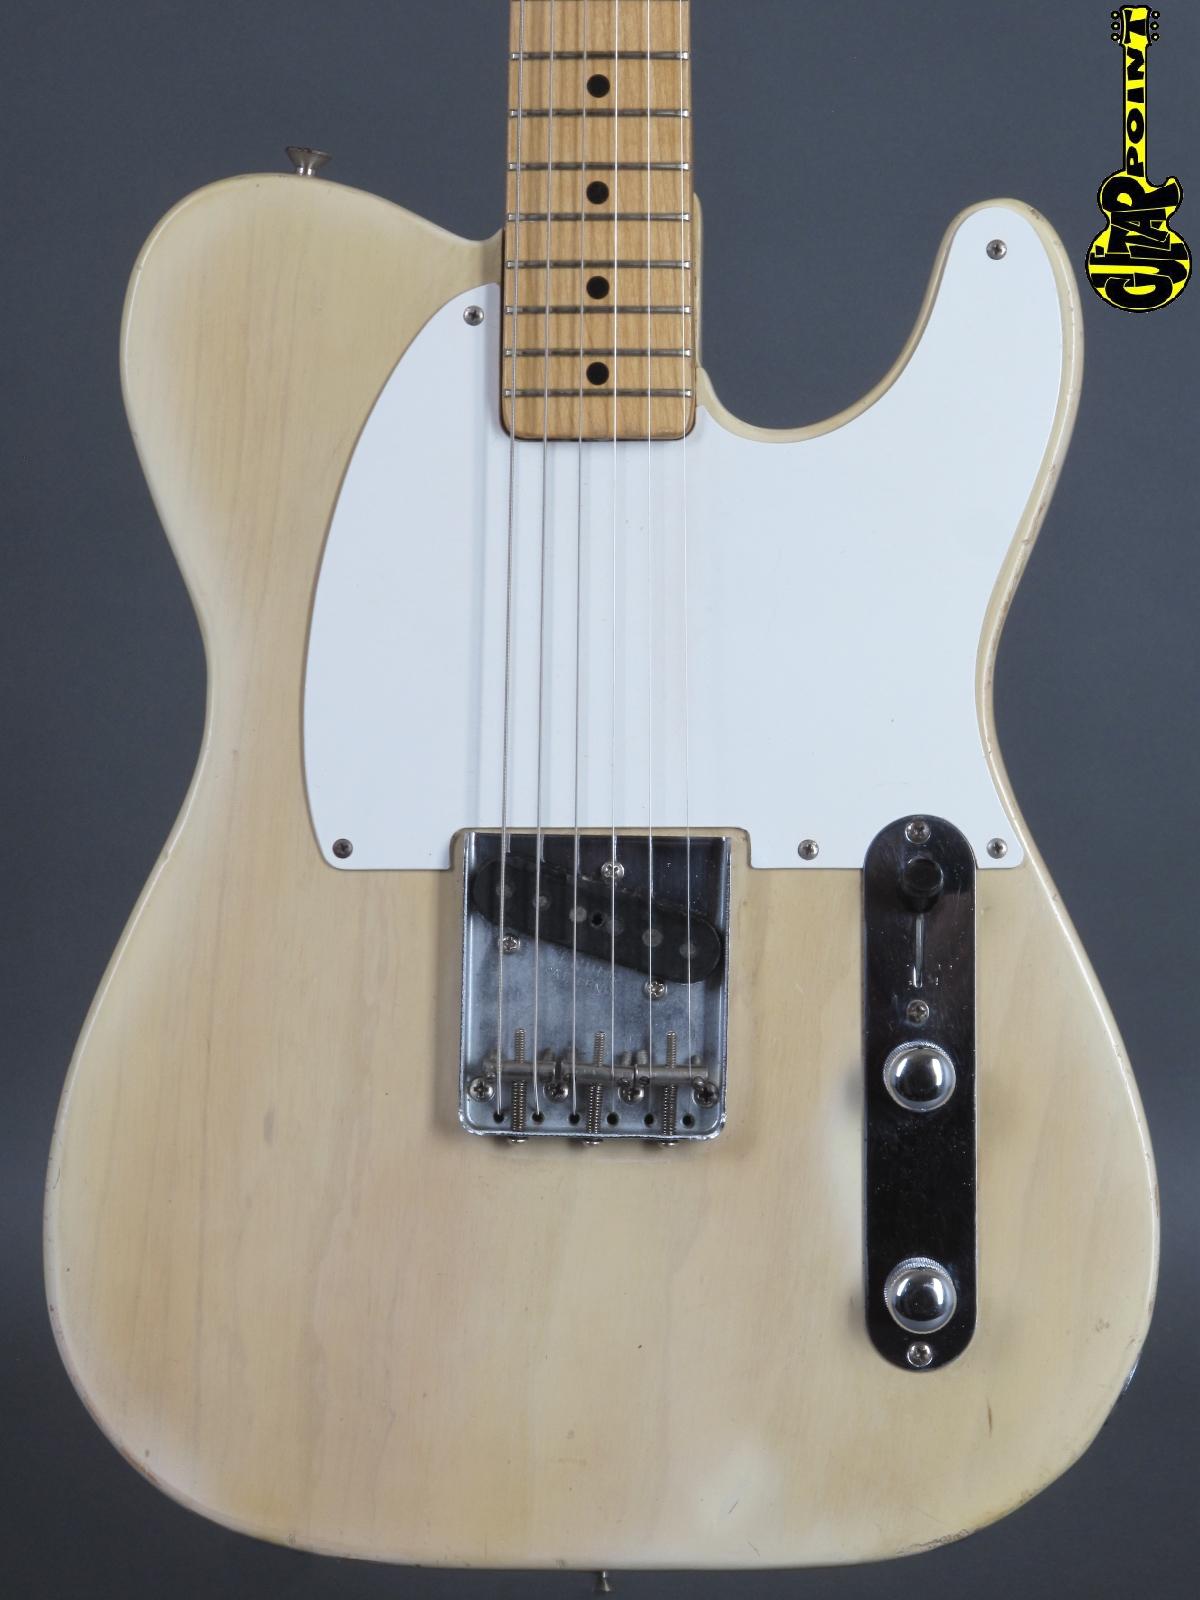 1955 Fender Esquire (Telecaster) - Blond   ...only 2,76 Kg!